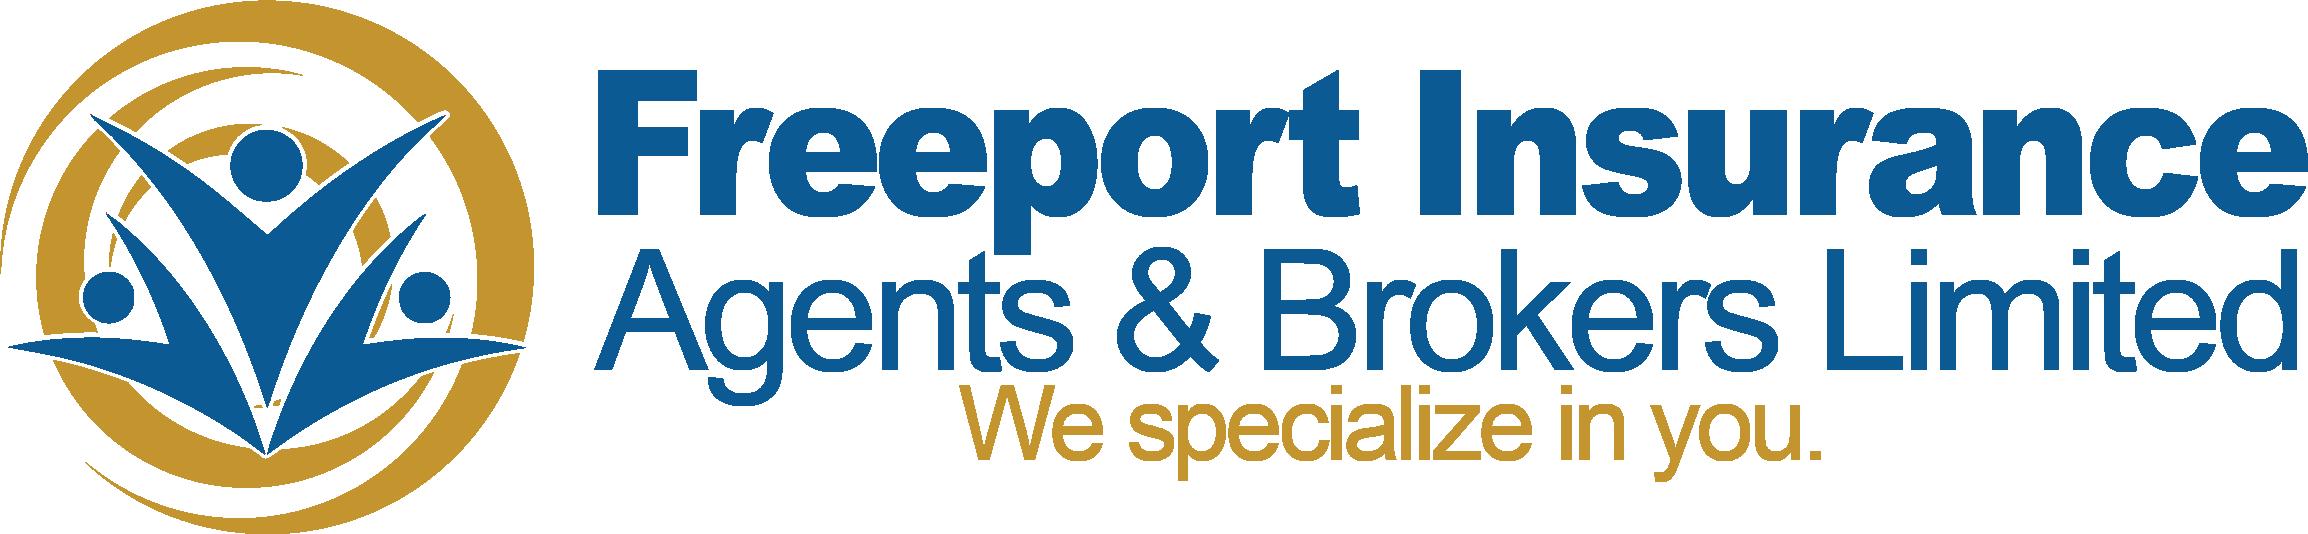 Freeport Insurance Agents & Brokers